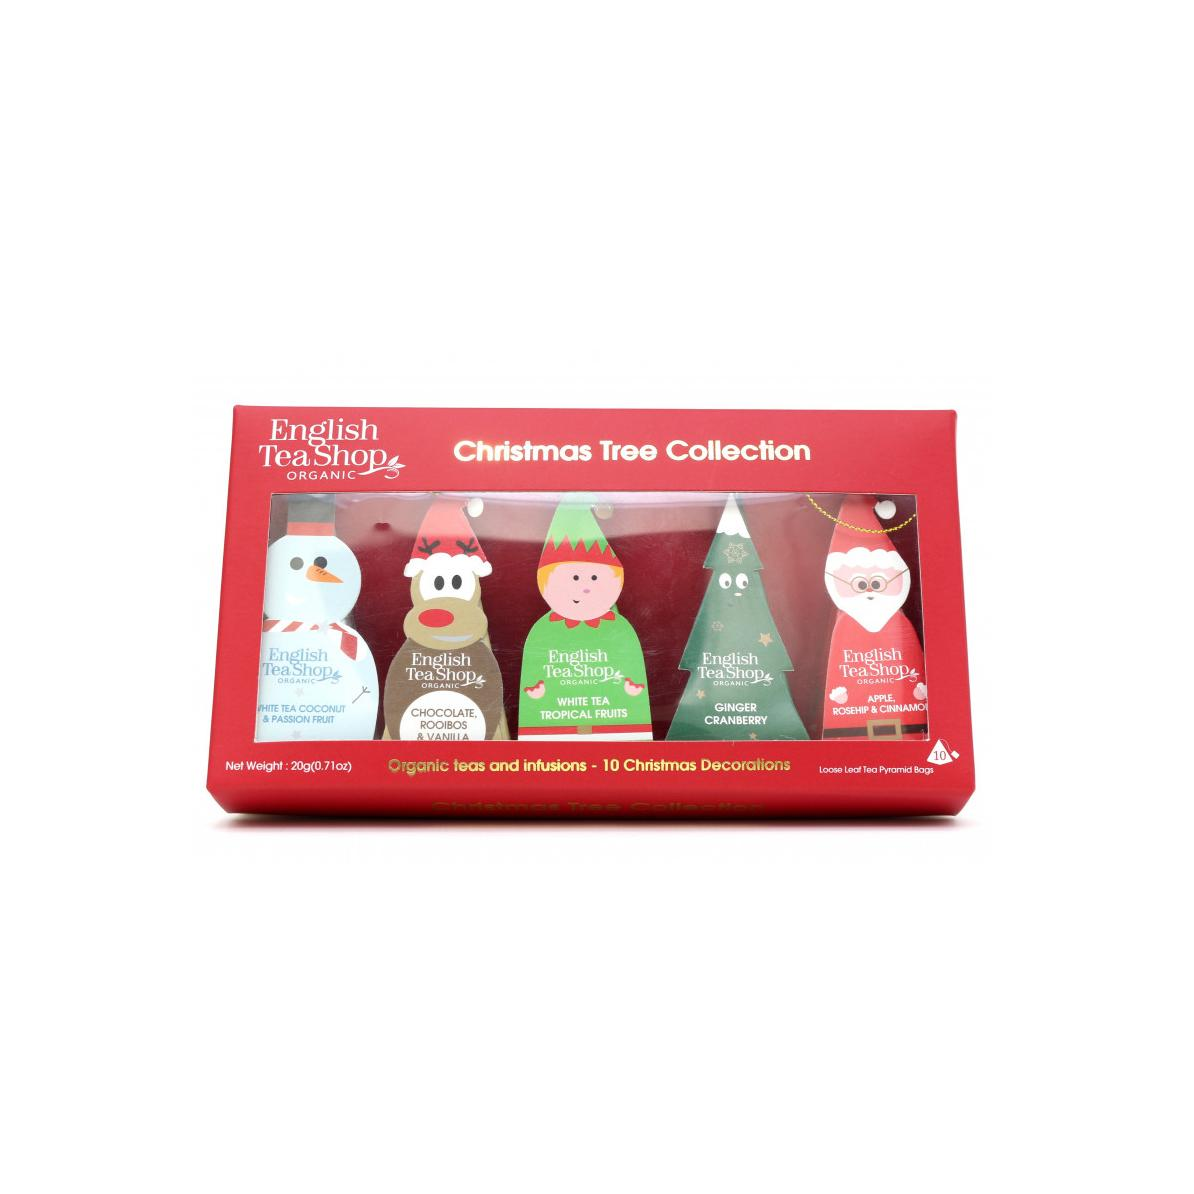 English Tea Shop Vánoční figurky, 10 pyramidek, bio 20 g, 10 ks